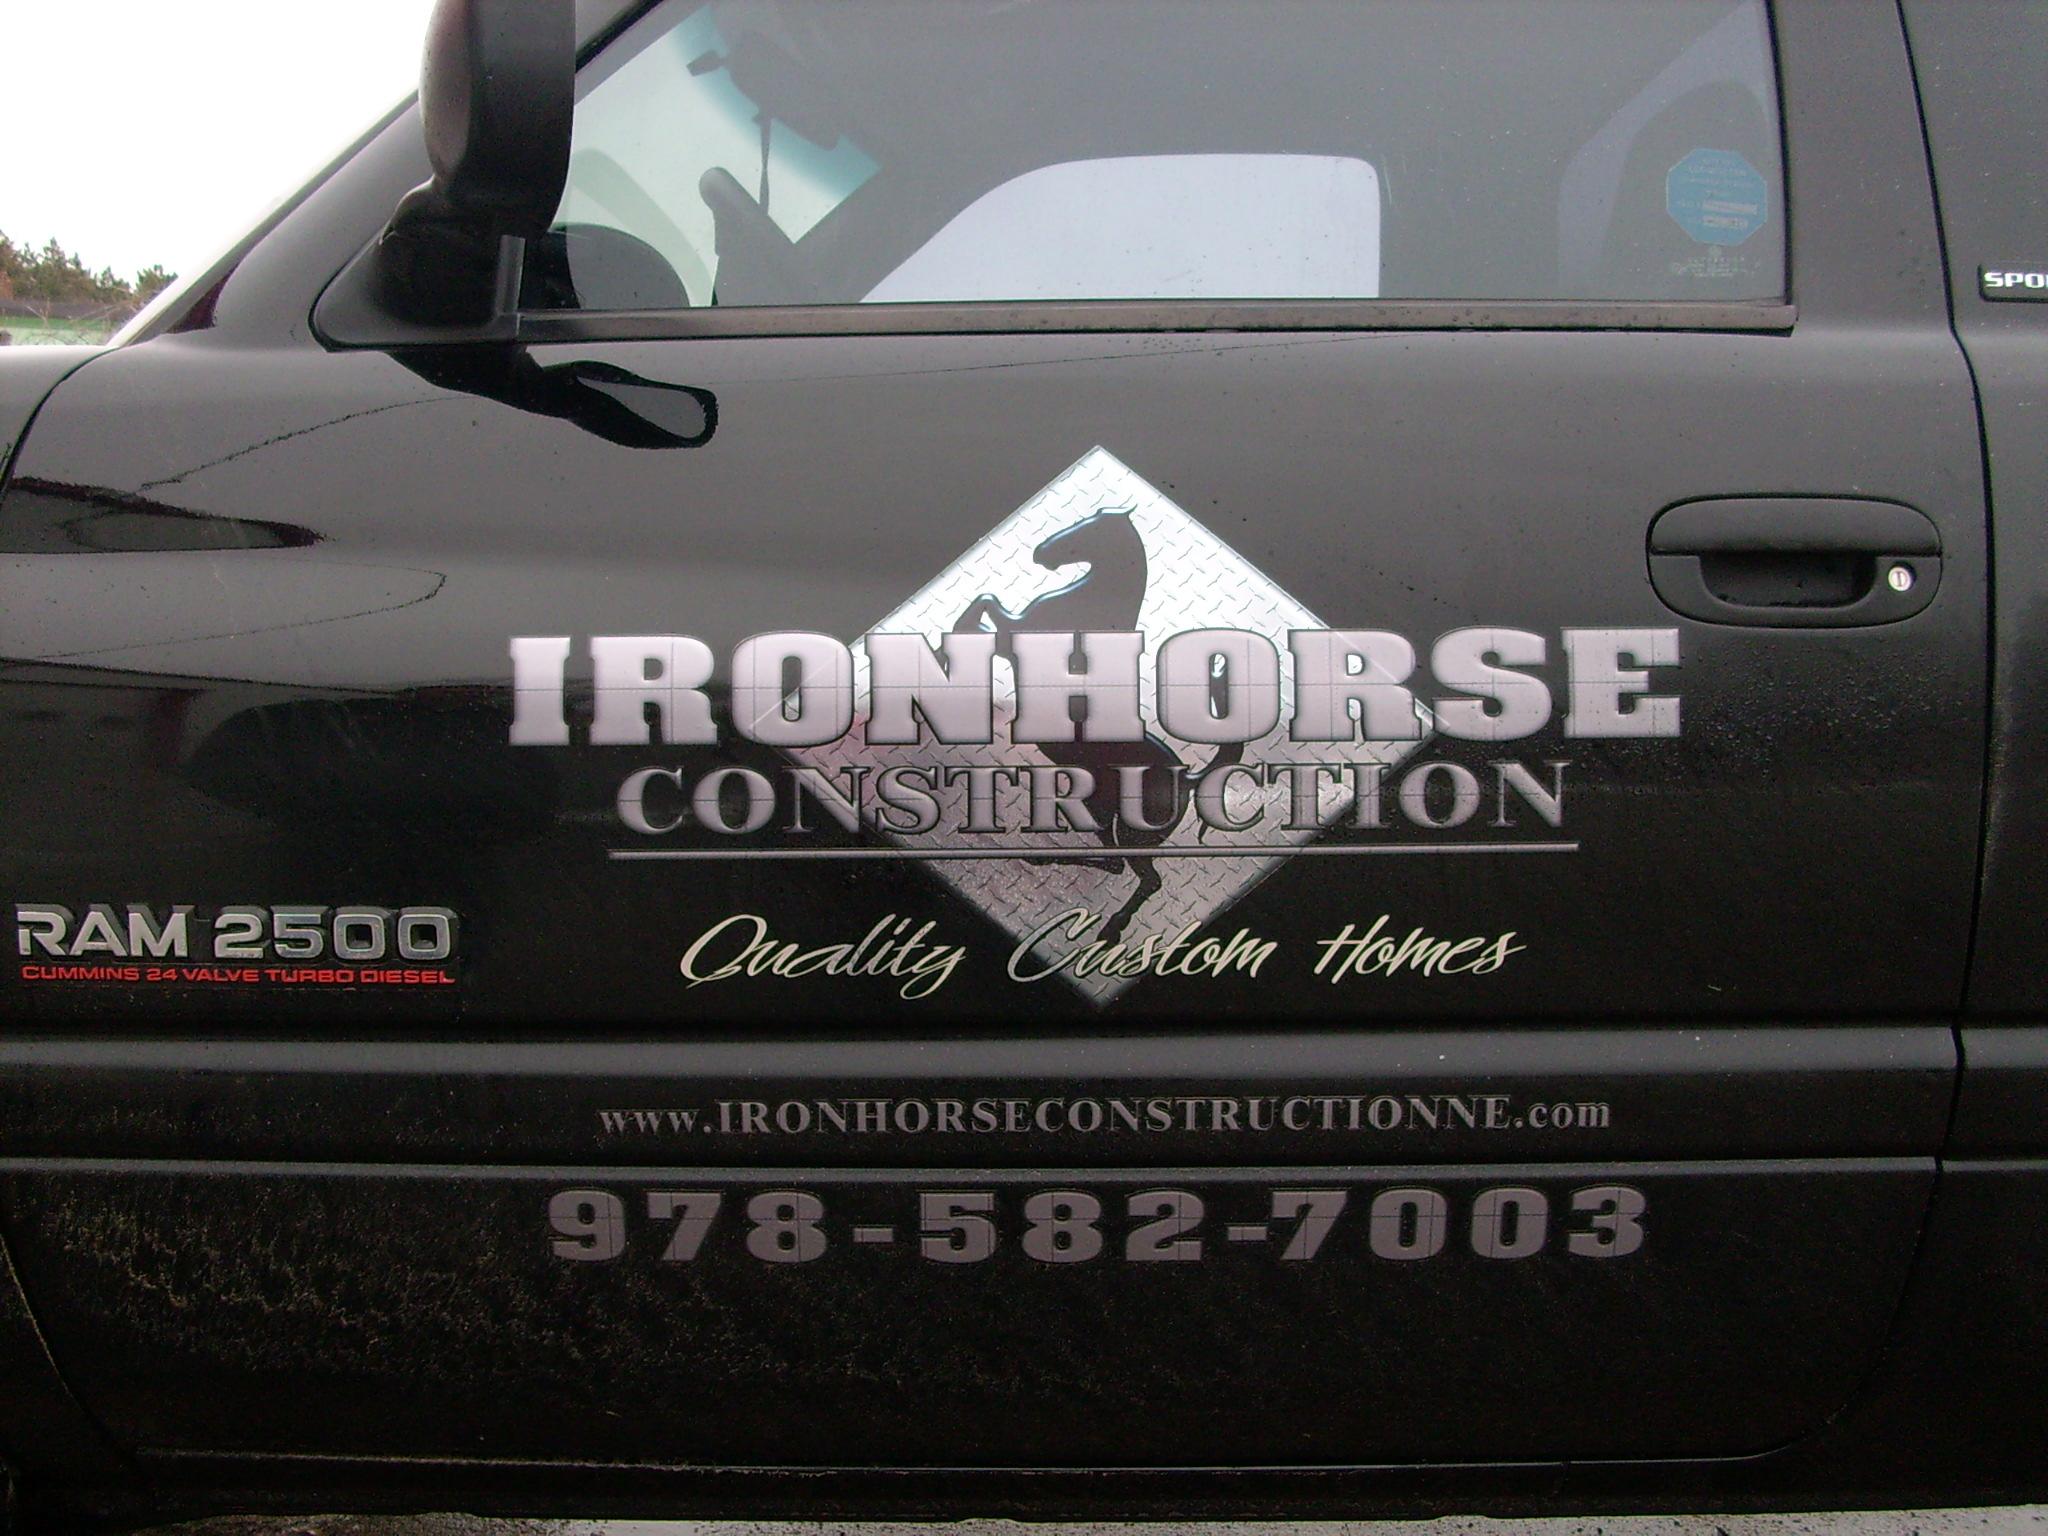 Iron Horse Construction Truck.JPG